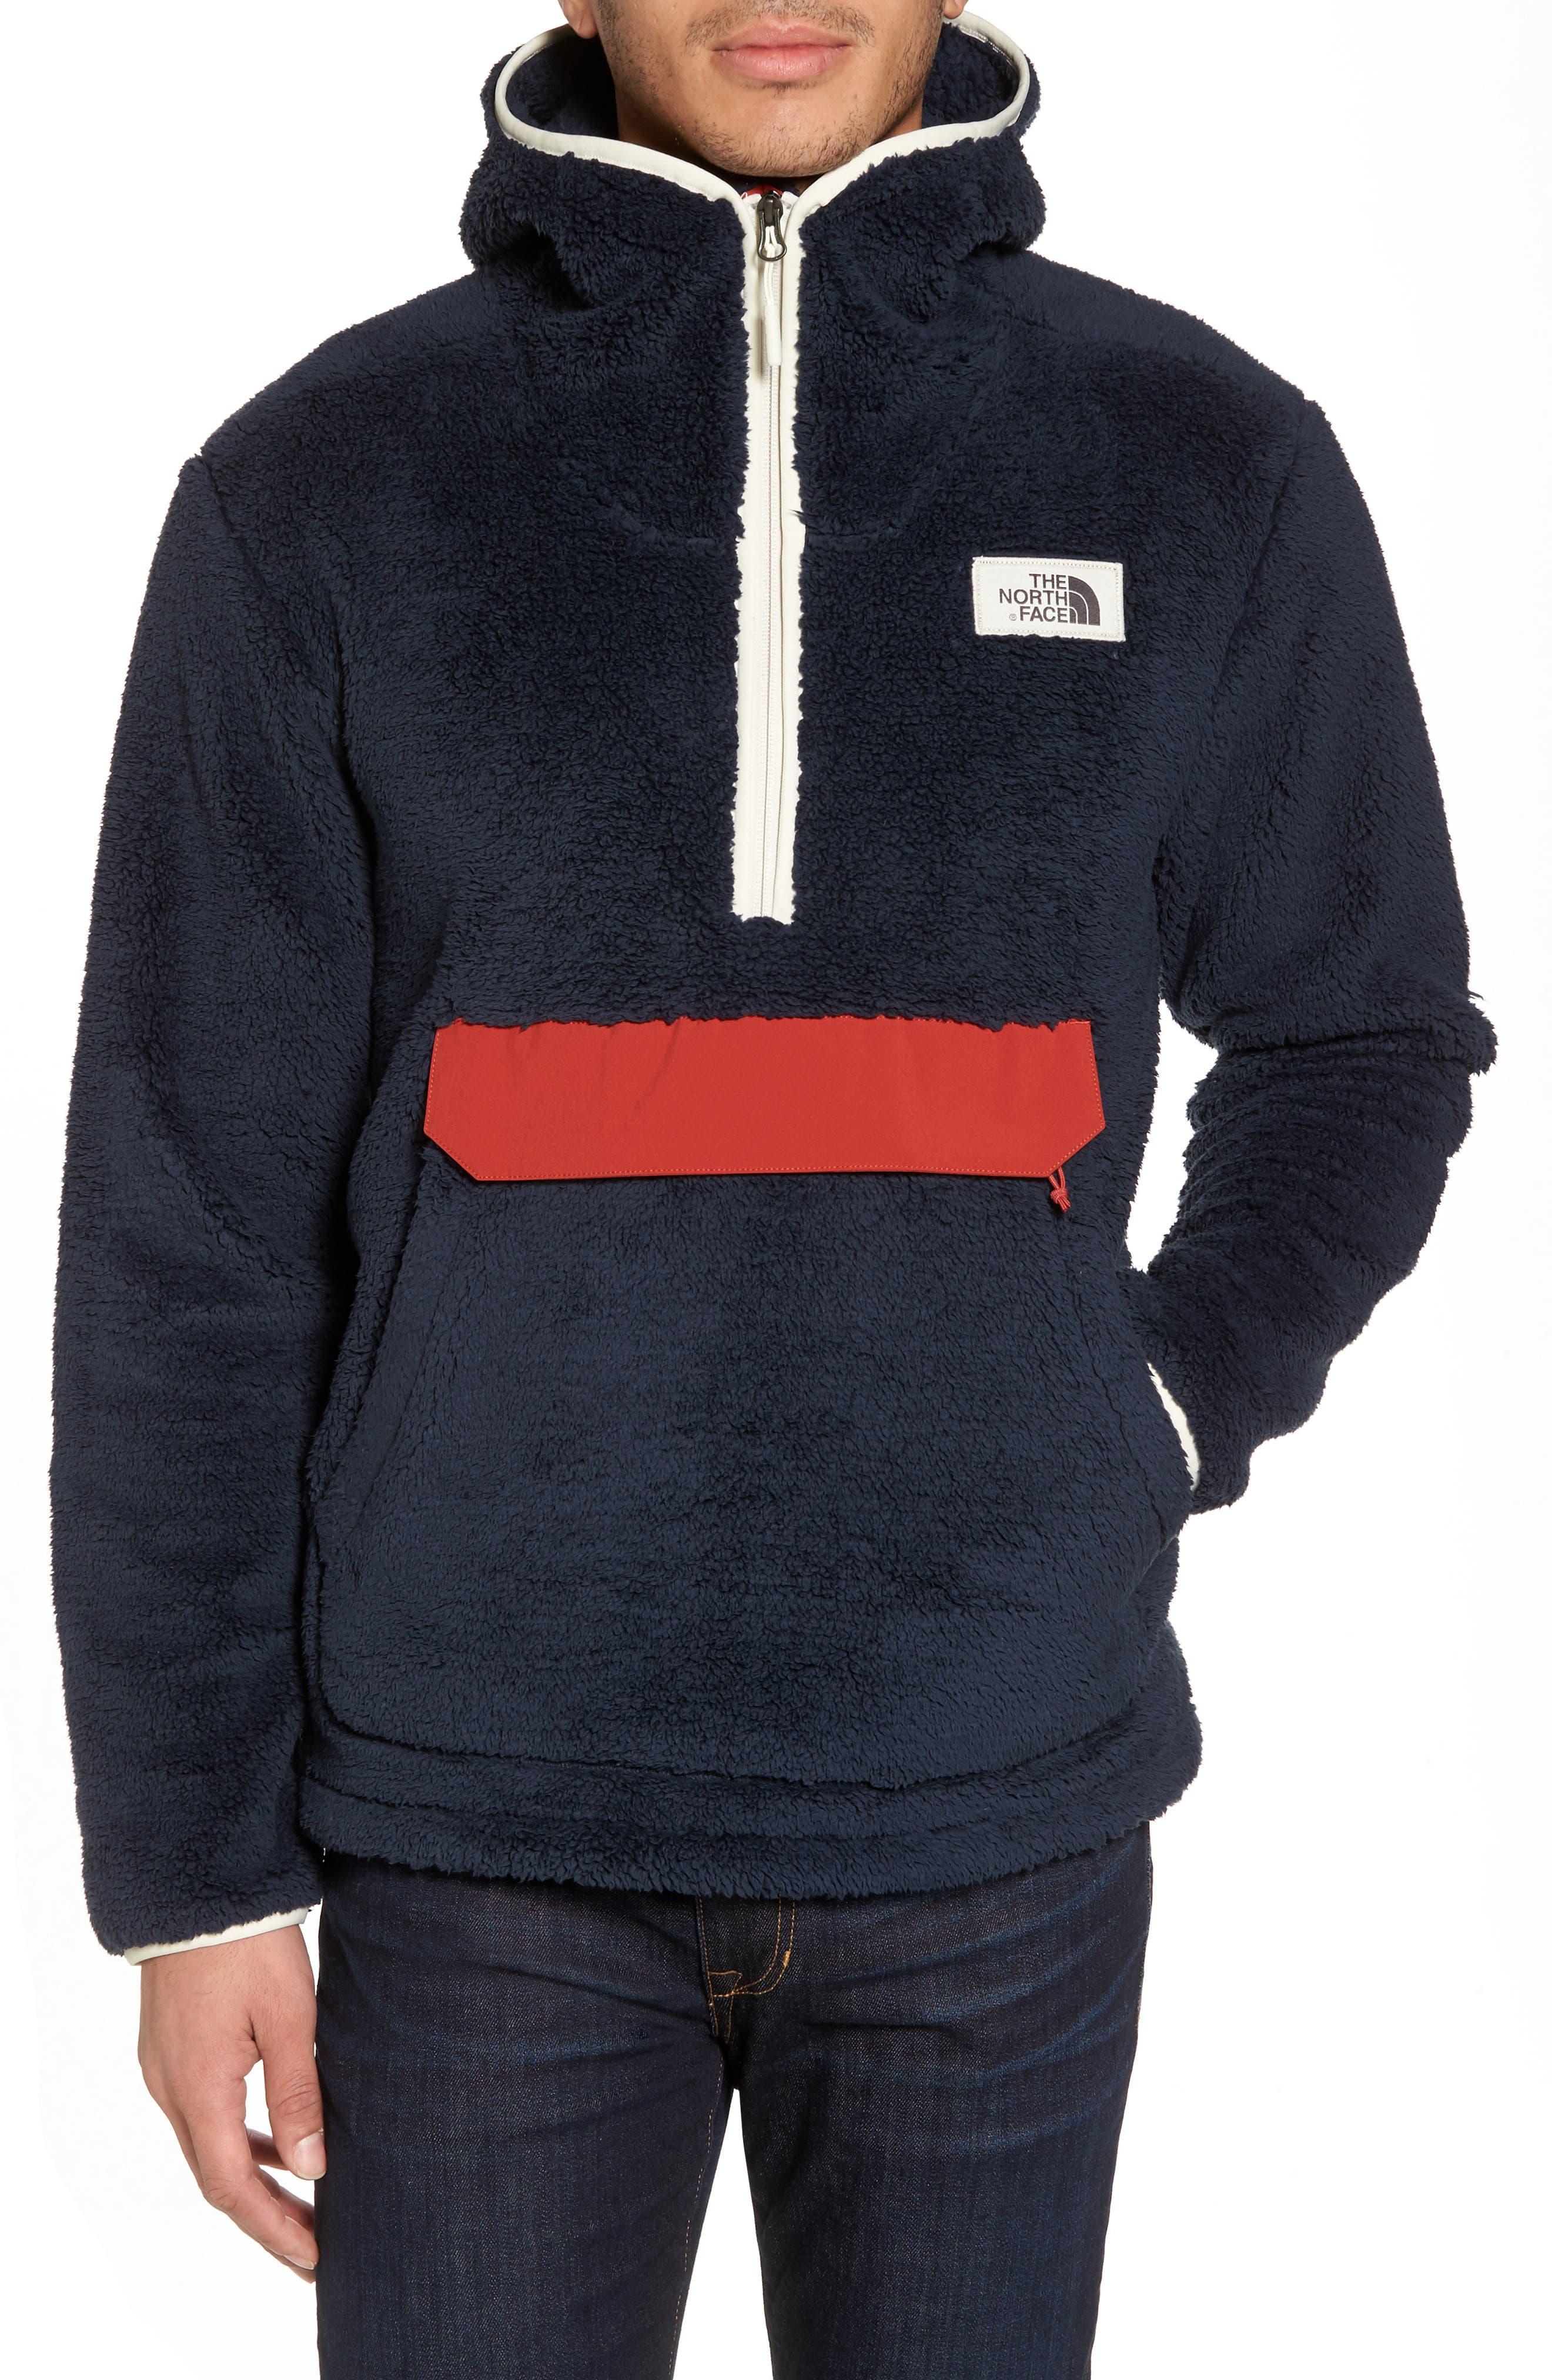 Campshire High Pile Fleece Pullover Hoodie,                         Main,                         color, Urban Navy/ Bossa Nova Red